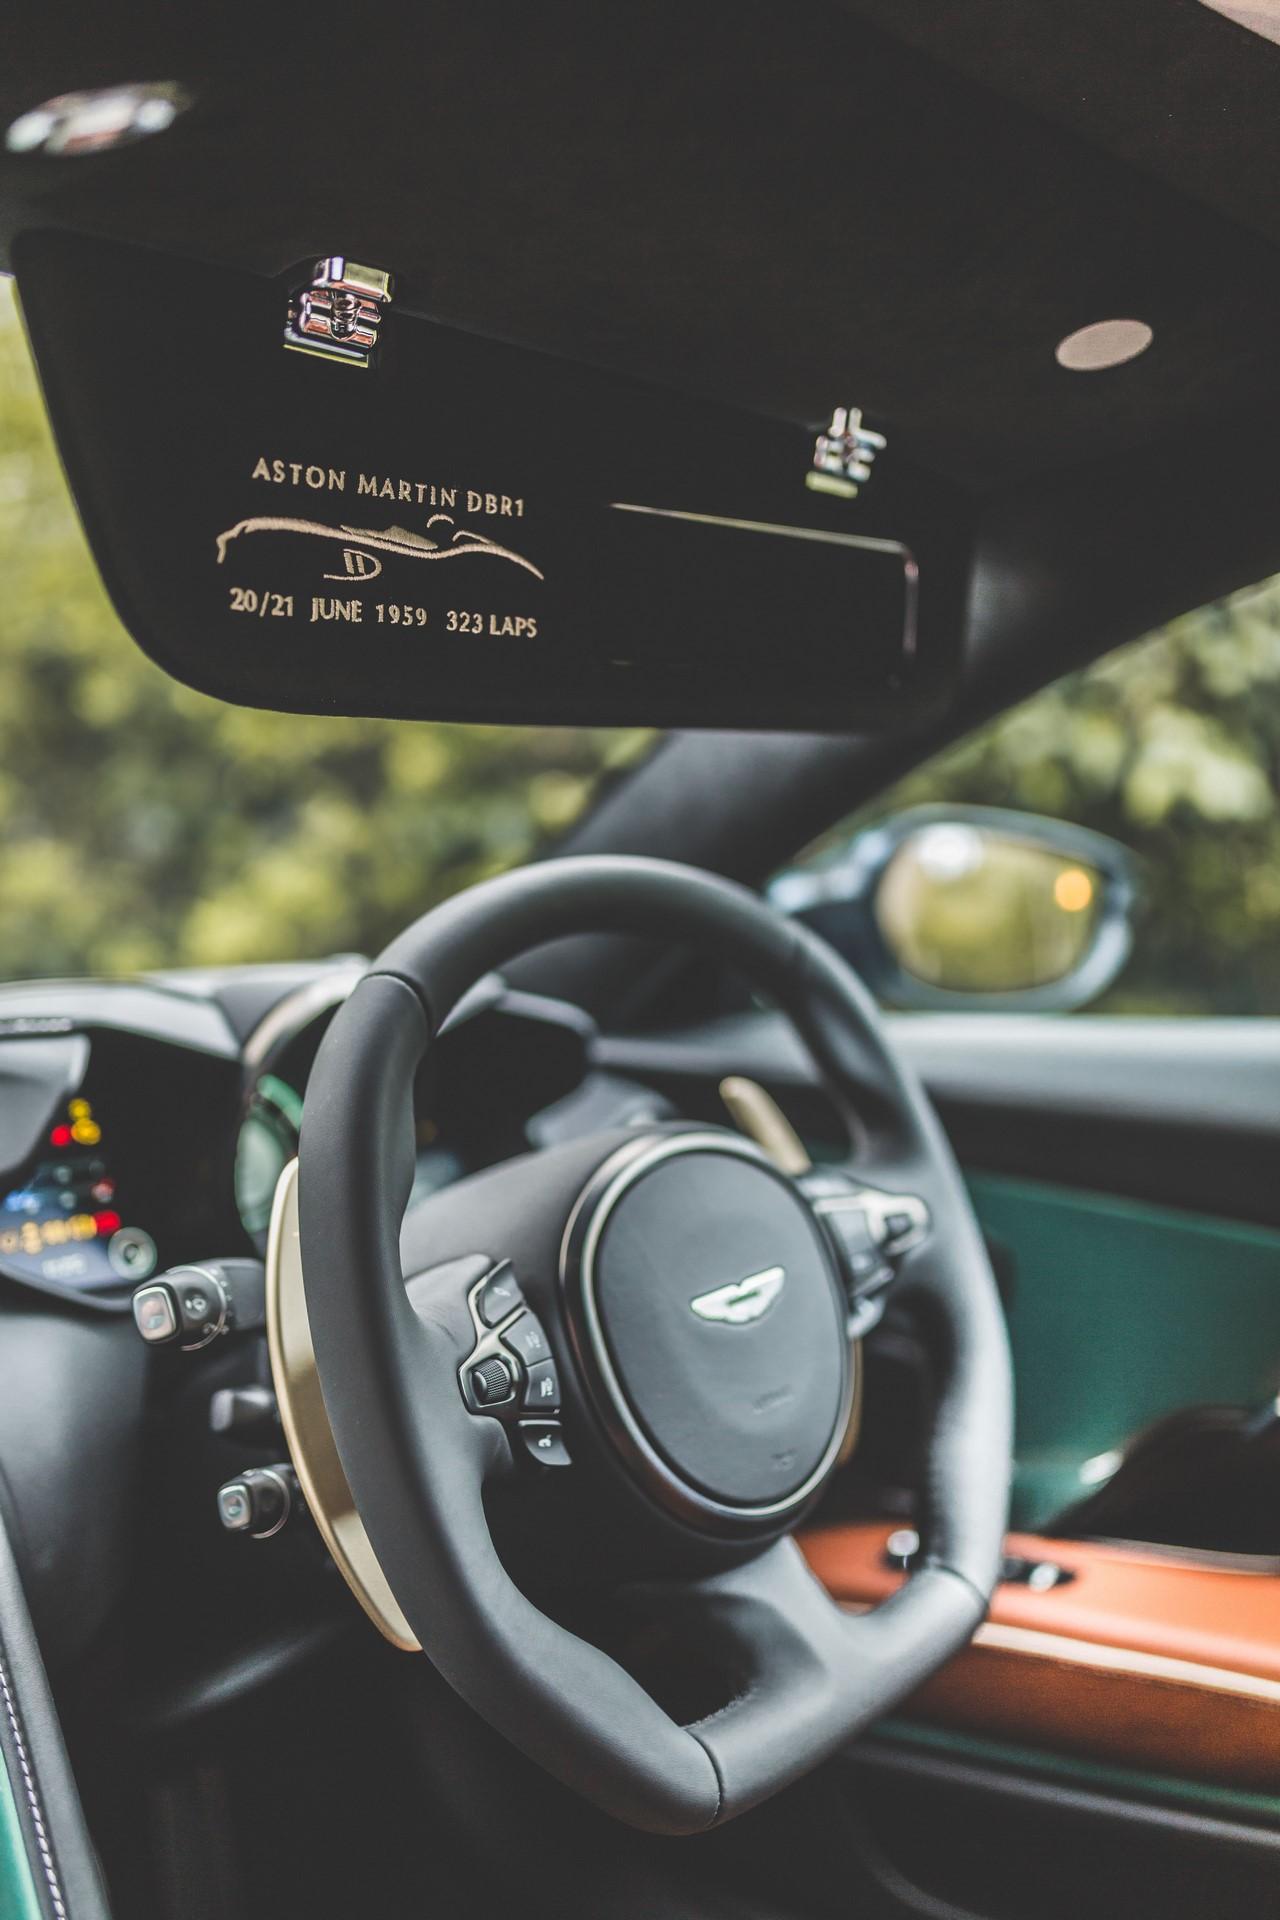 Aston-Martin-DBS-59-Edition-15